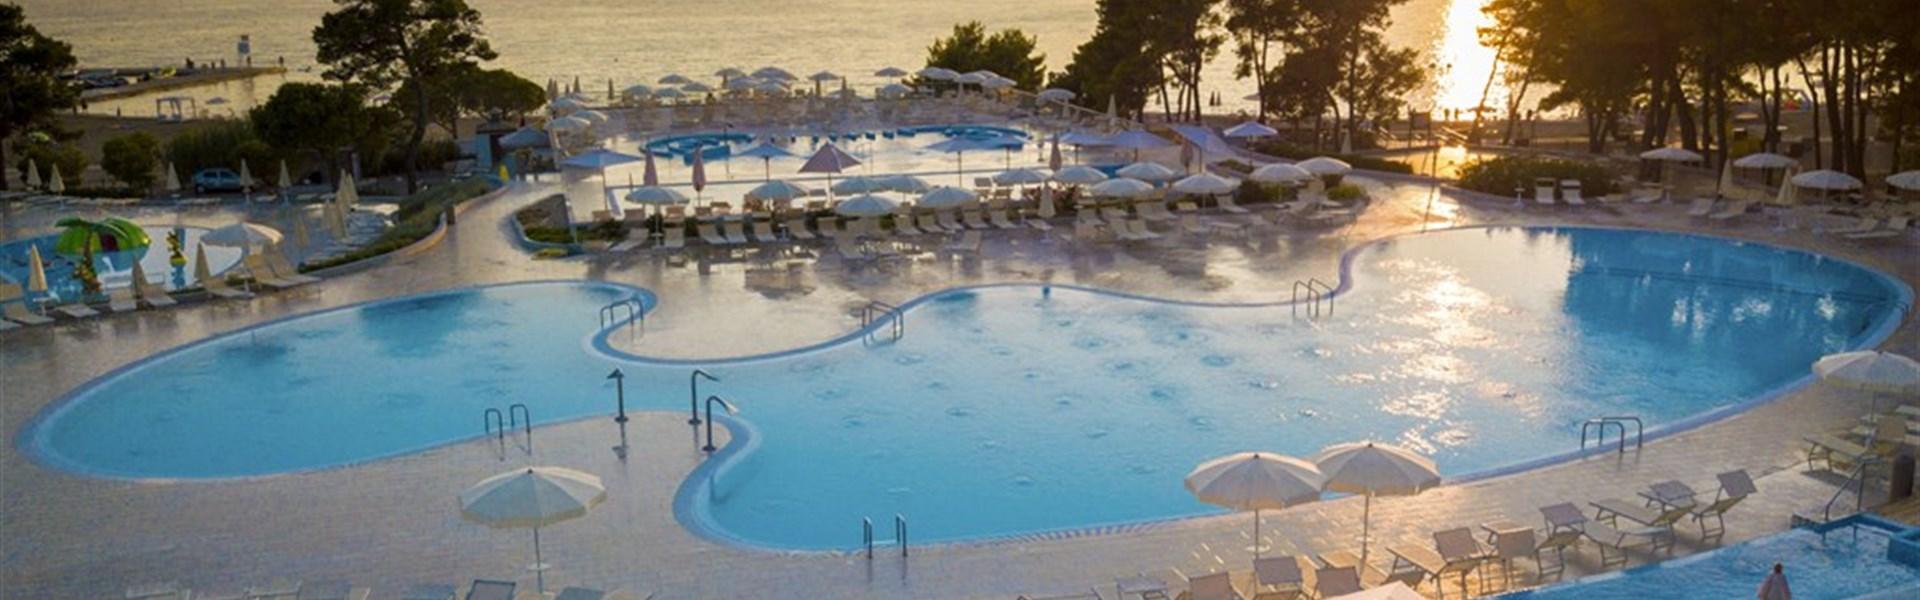 Marco Polo - Zaton Holiday Resort -